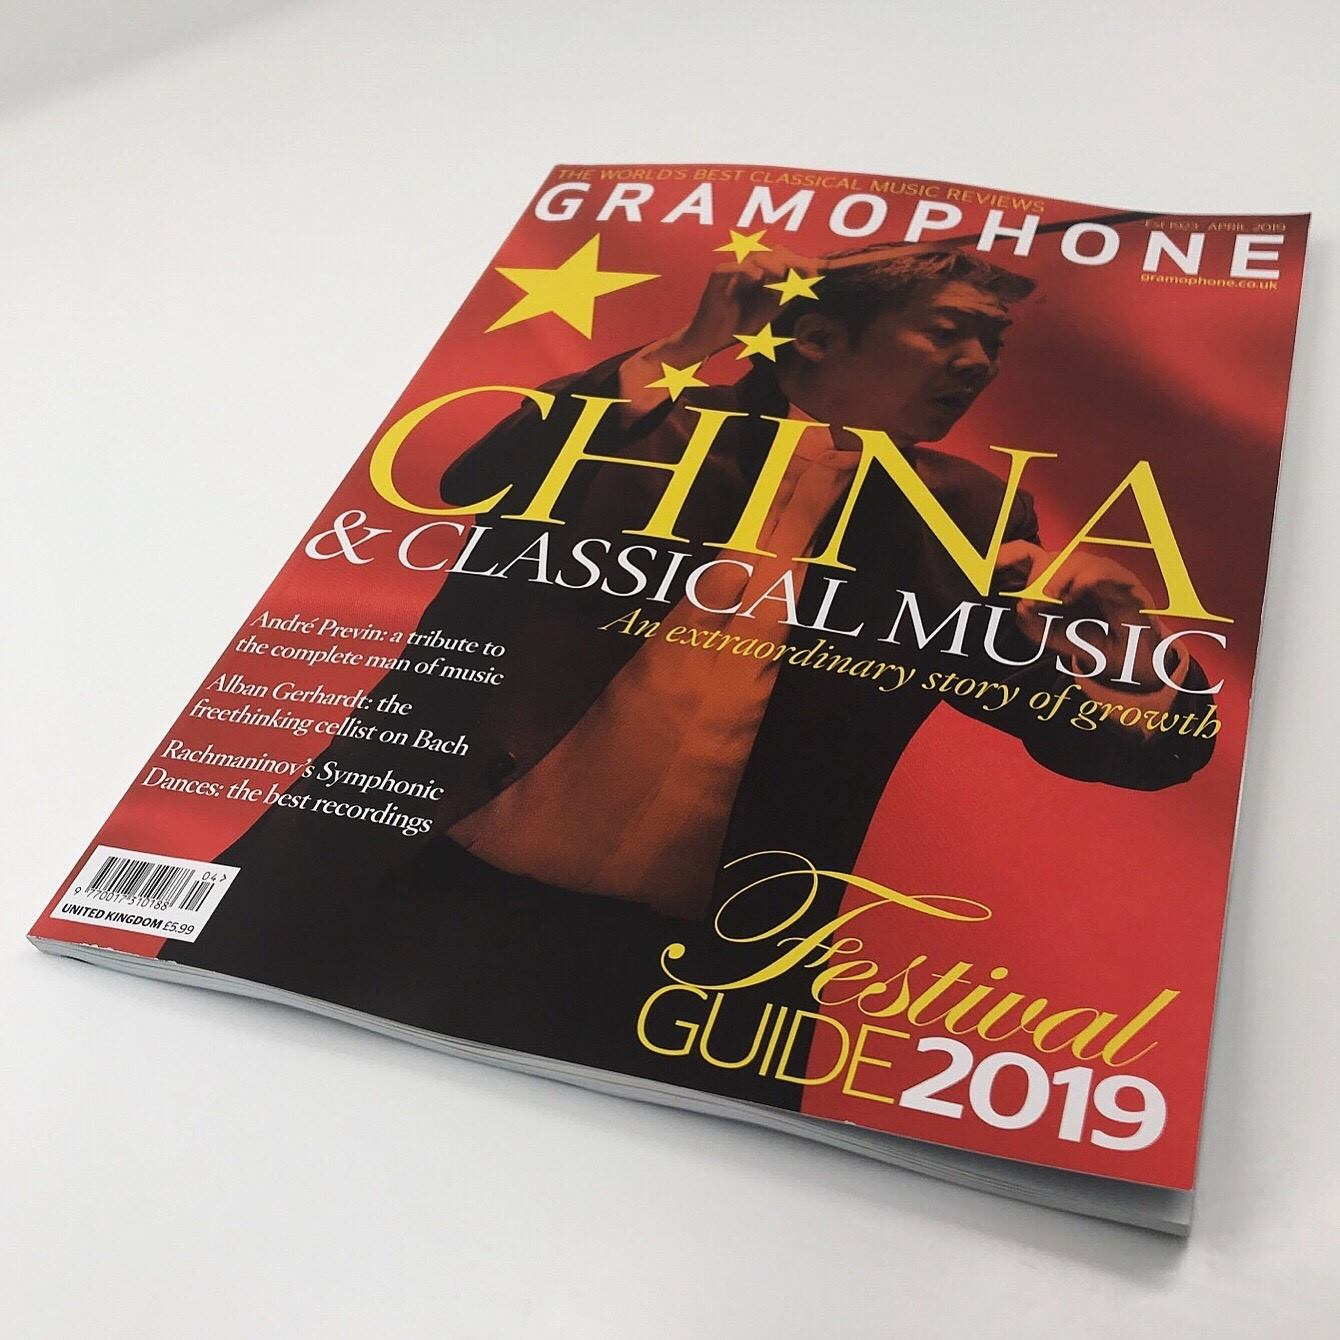 Classical Music News & Events - 8VA Music Consultancy